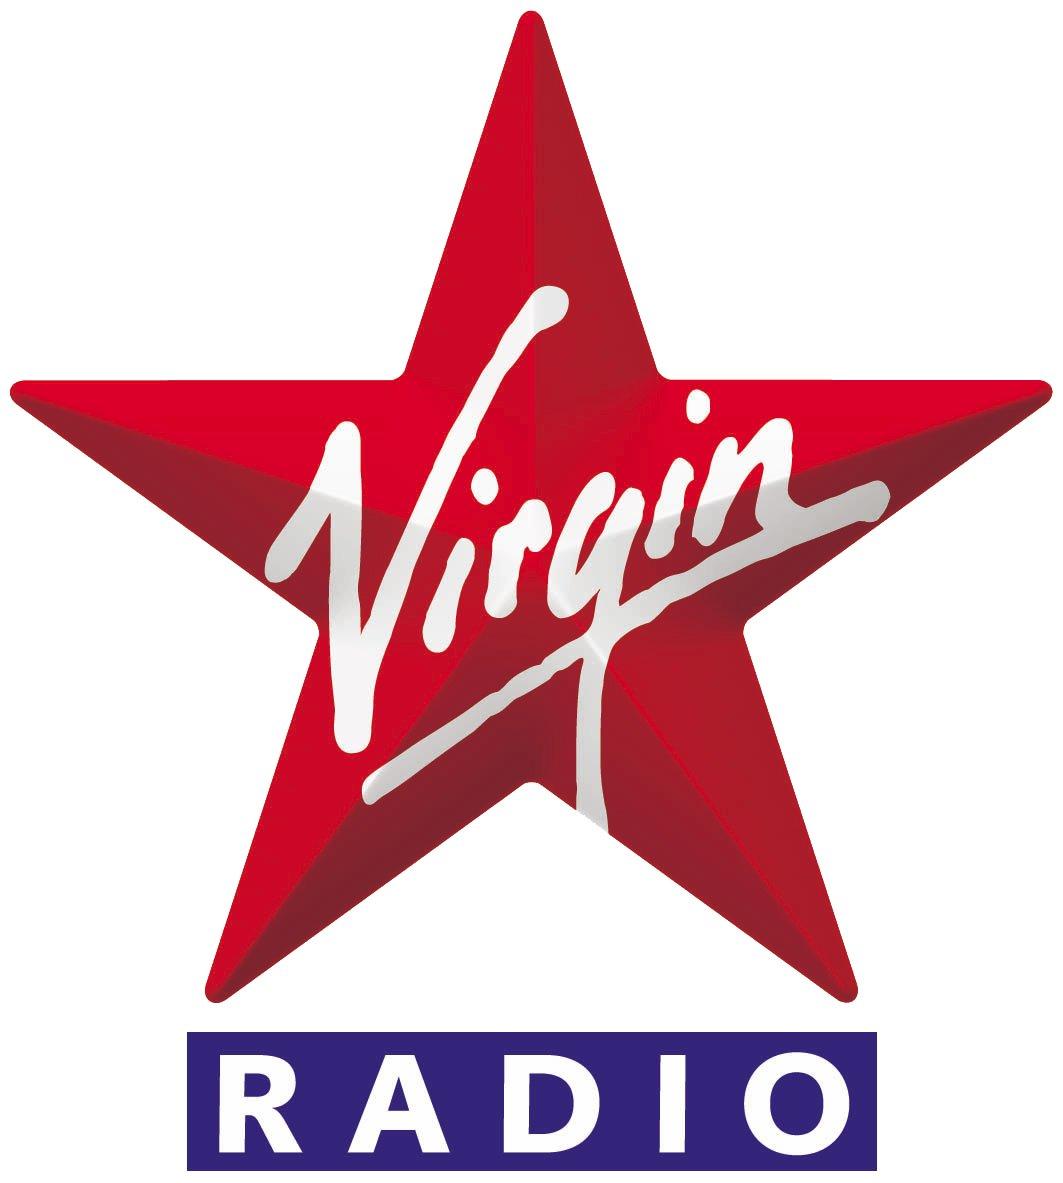 Virgin Radio fait évoluer son logo